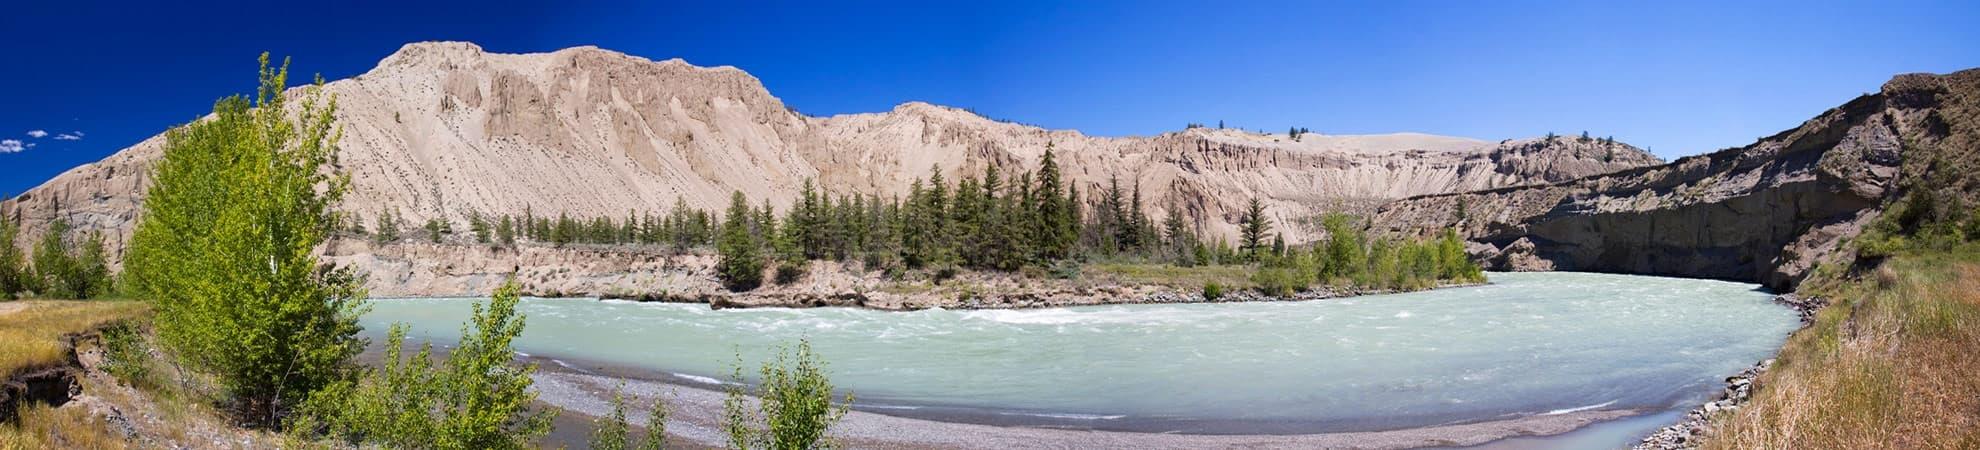 Voyage Cariboo Mountains